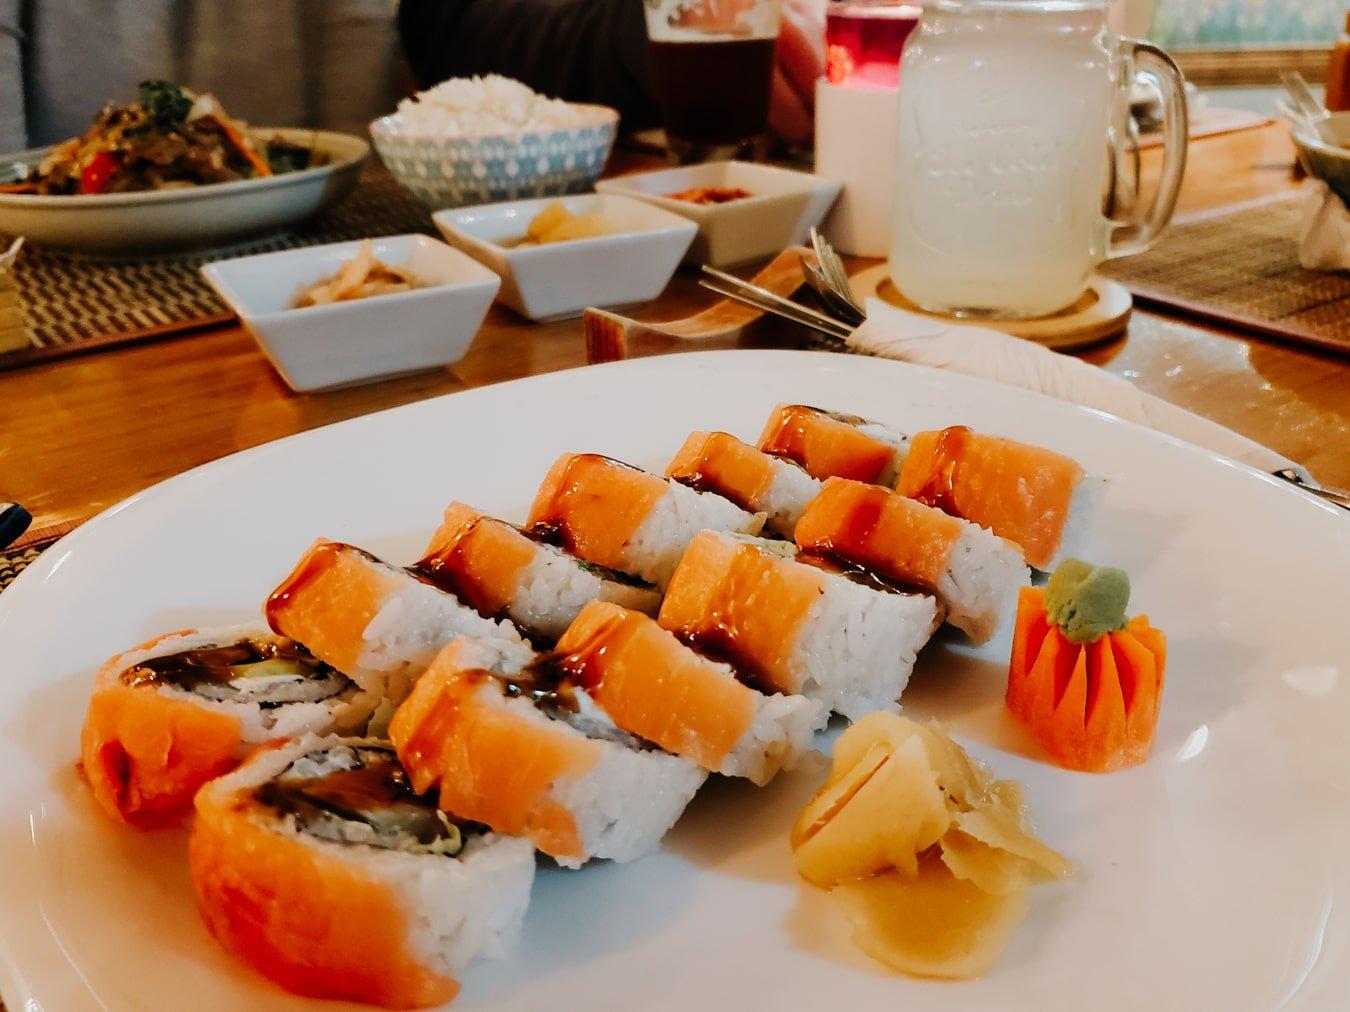 sushi rolls at teddy's comida coreana restaurant in san cristobal de las casas